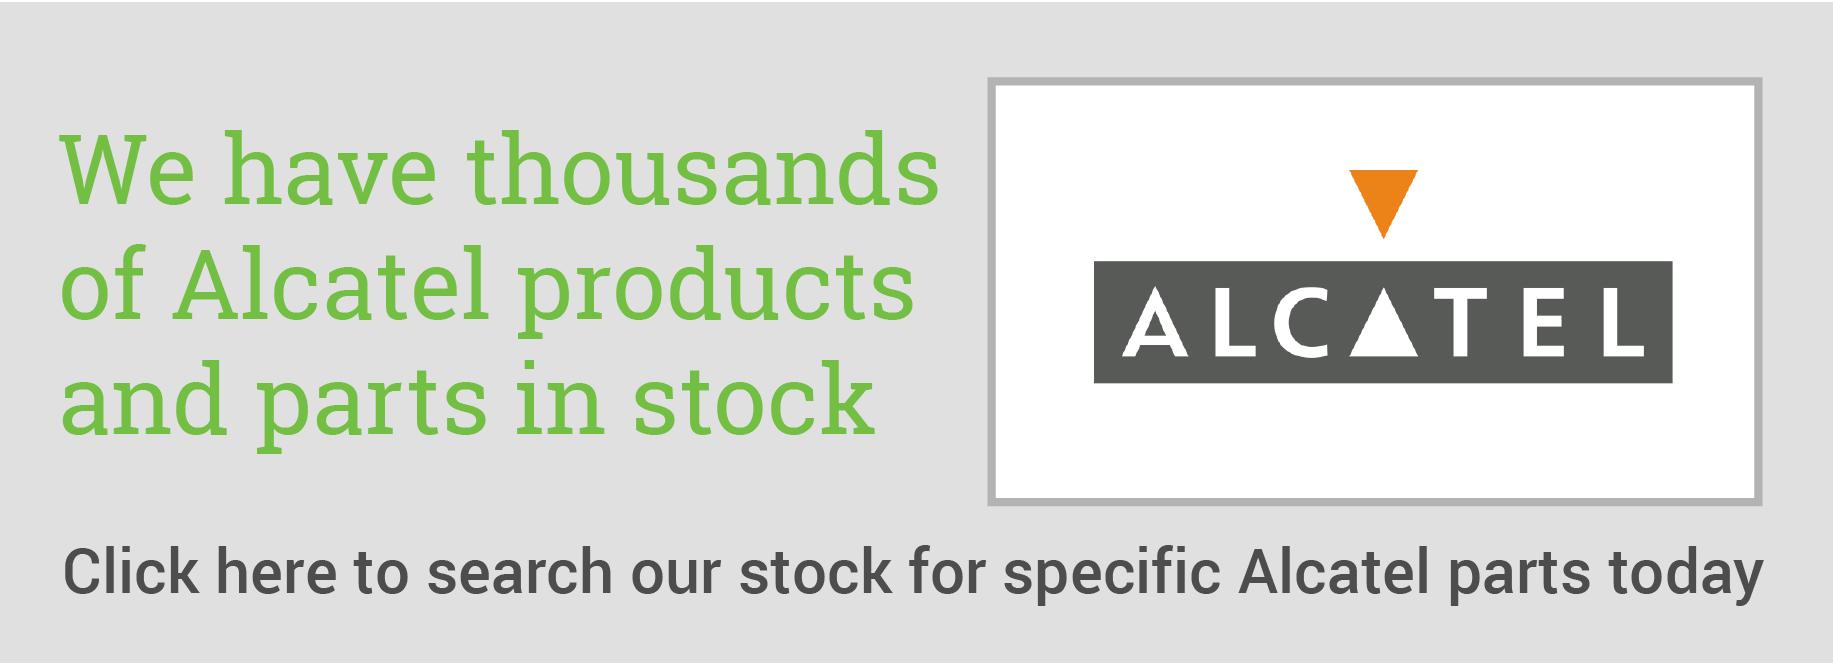 alcatel-products-01